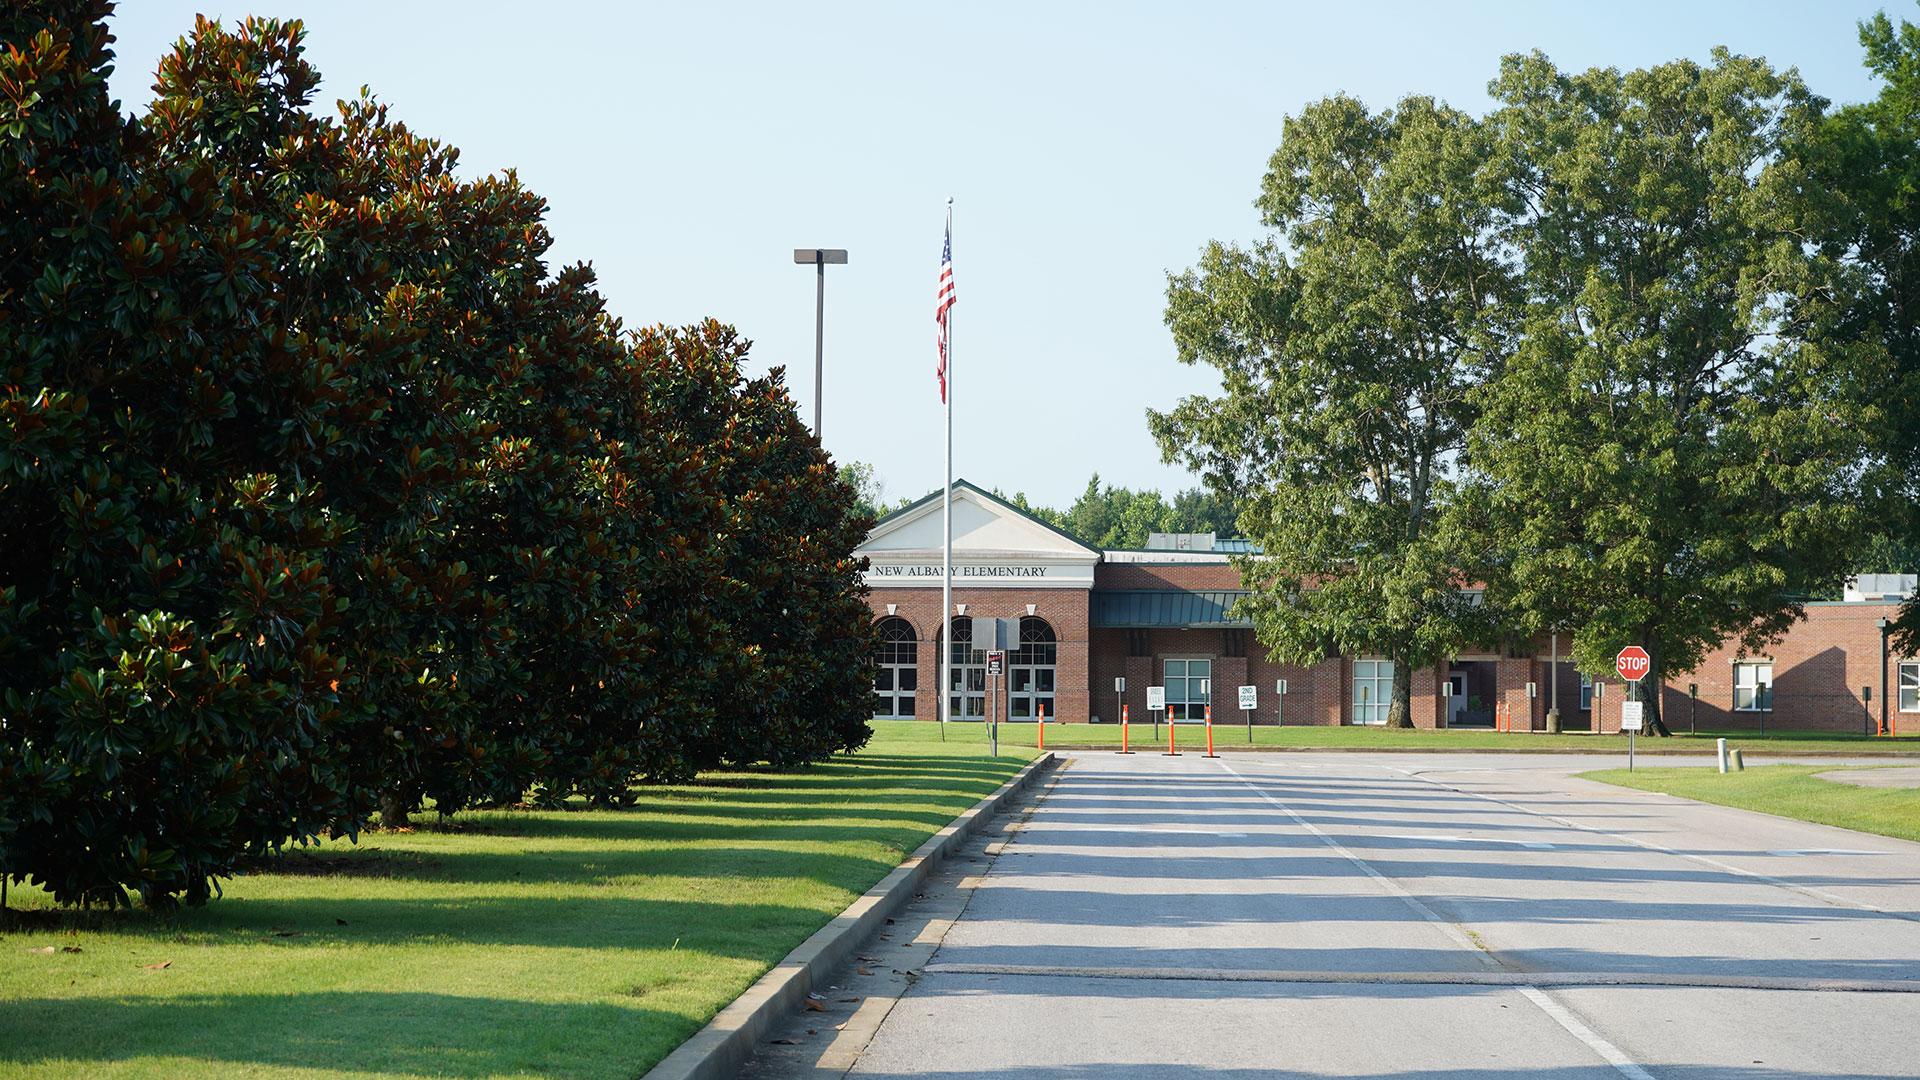 New Albany Elementary